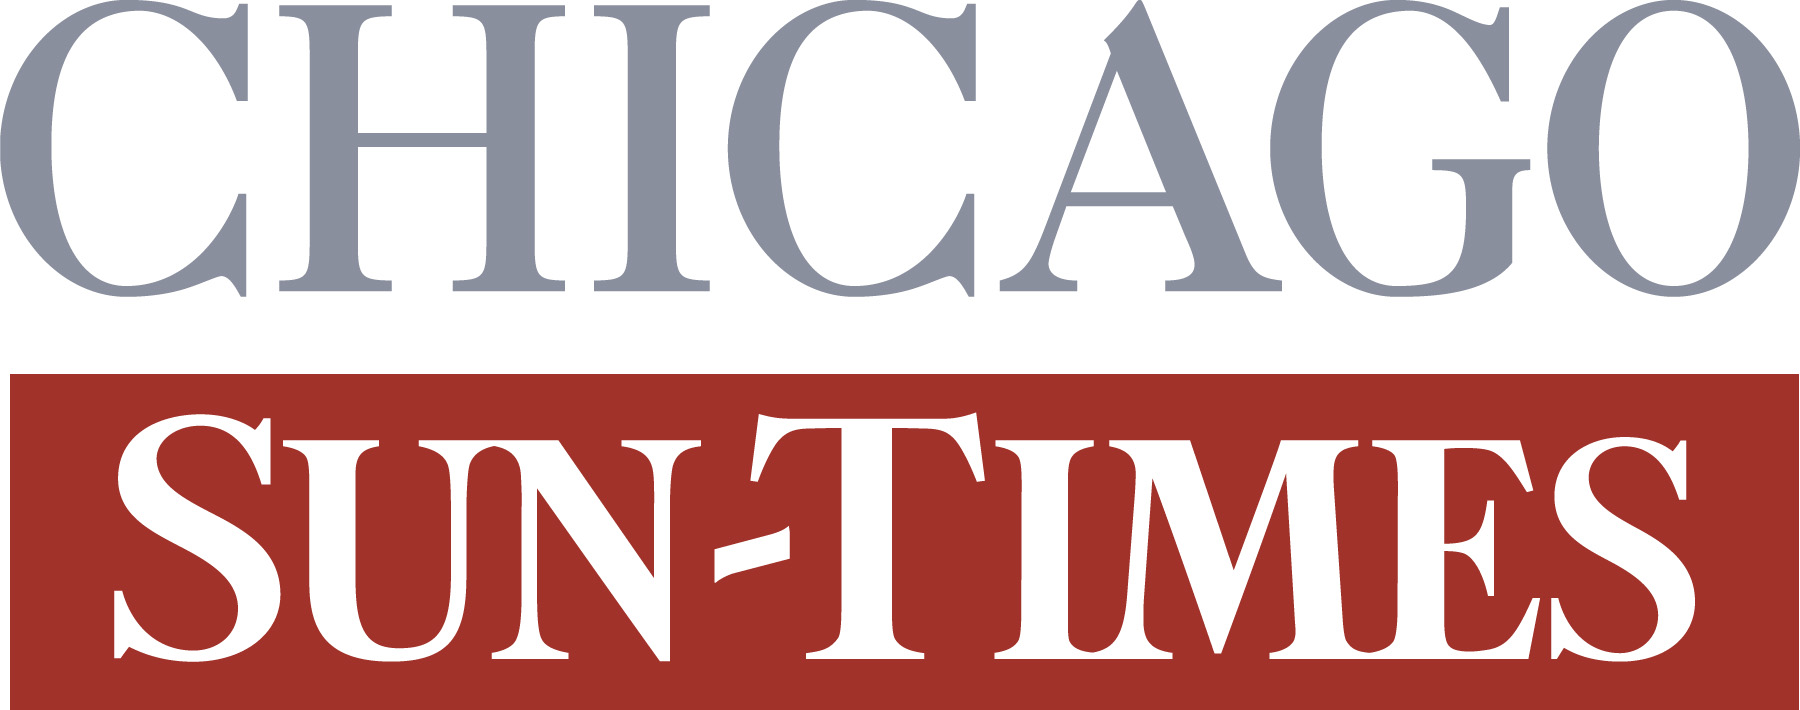 Chicago-Sun-Times-Logo.jpg